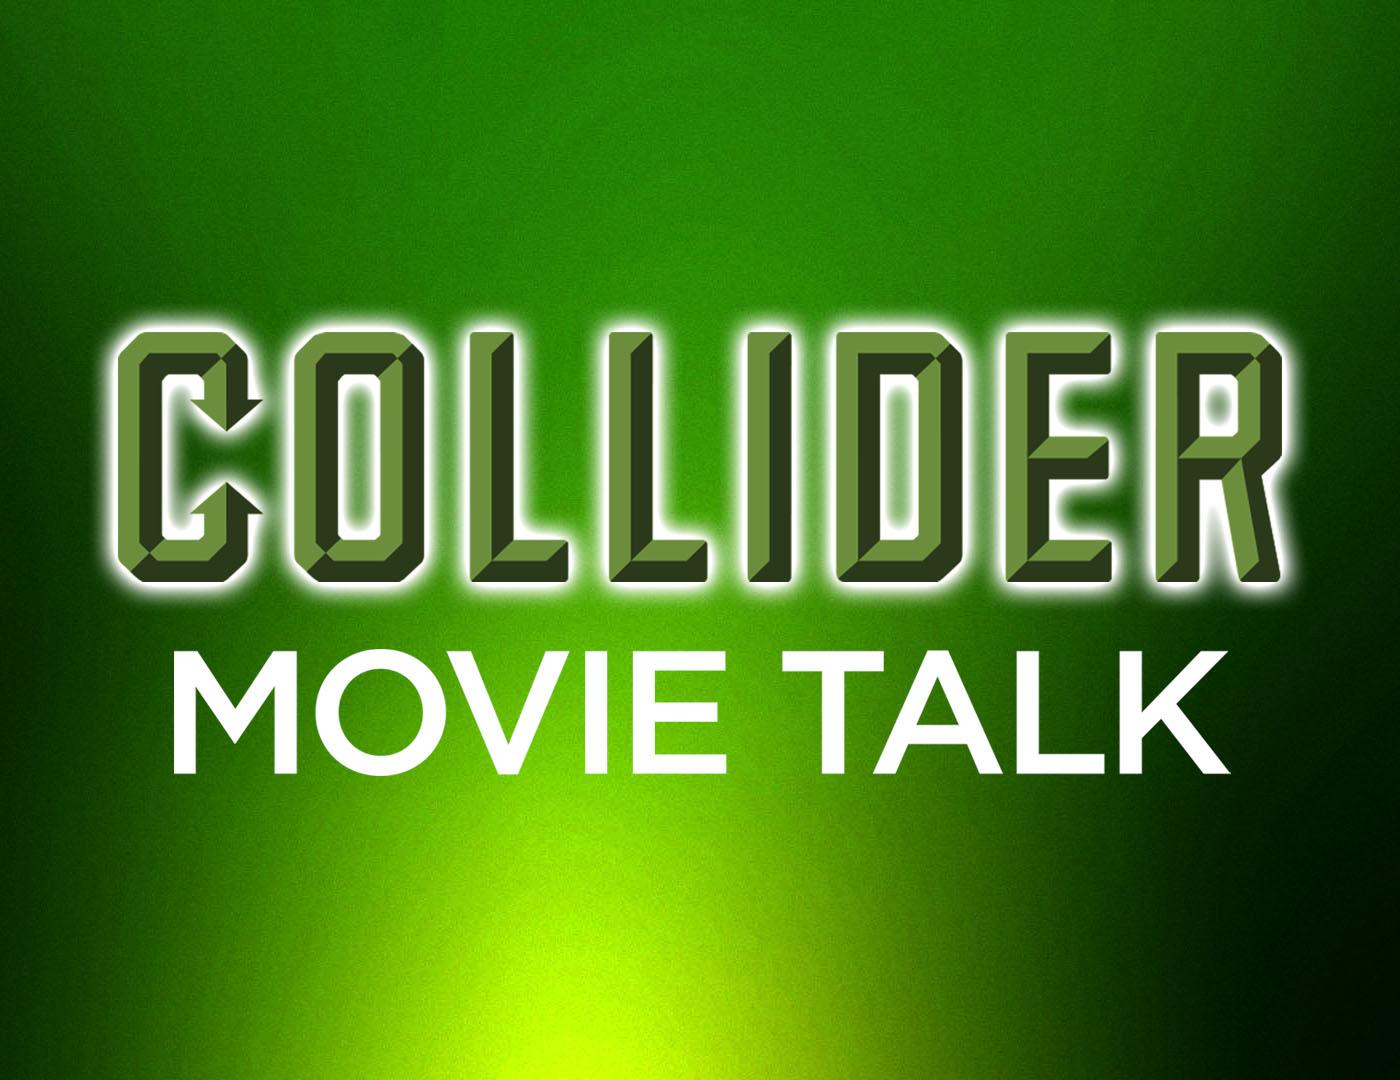 Collider Movie Talk - Batman V Superman: Wonder Woman Details, Star Wars Breaks All Time Record